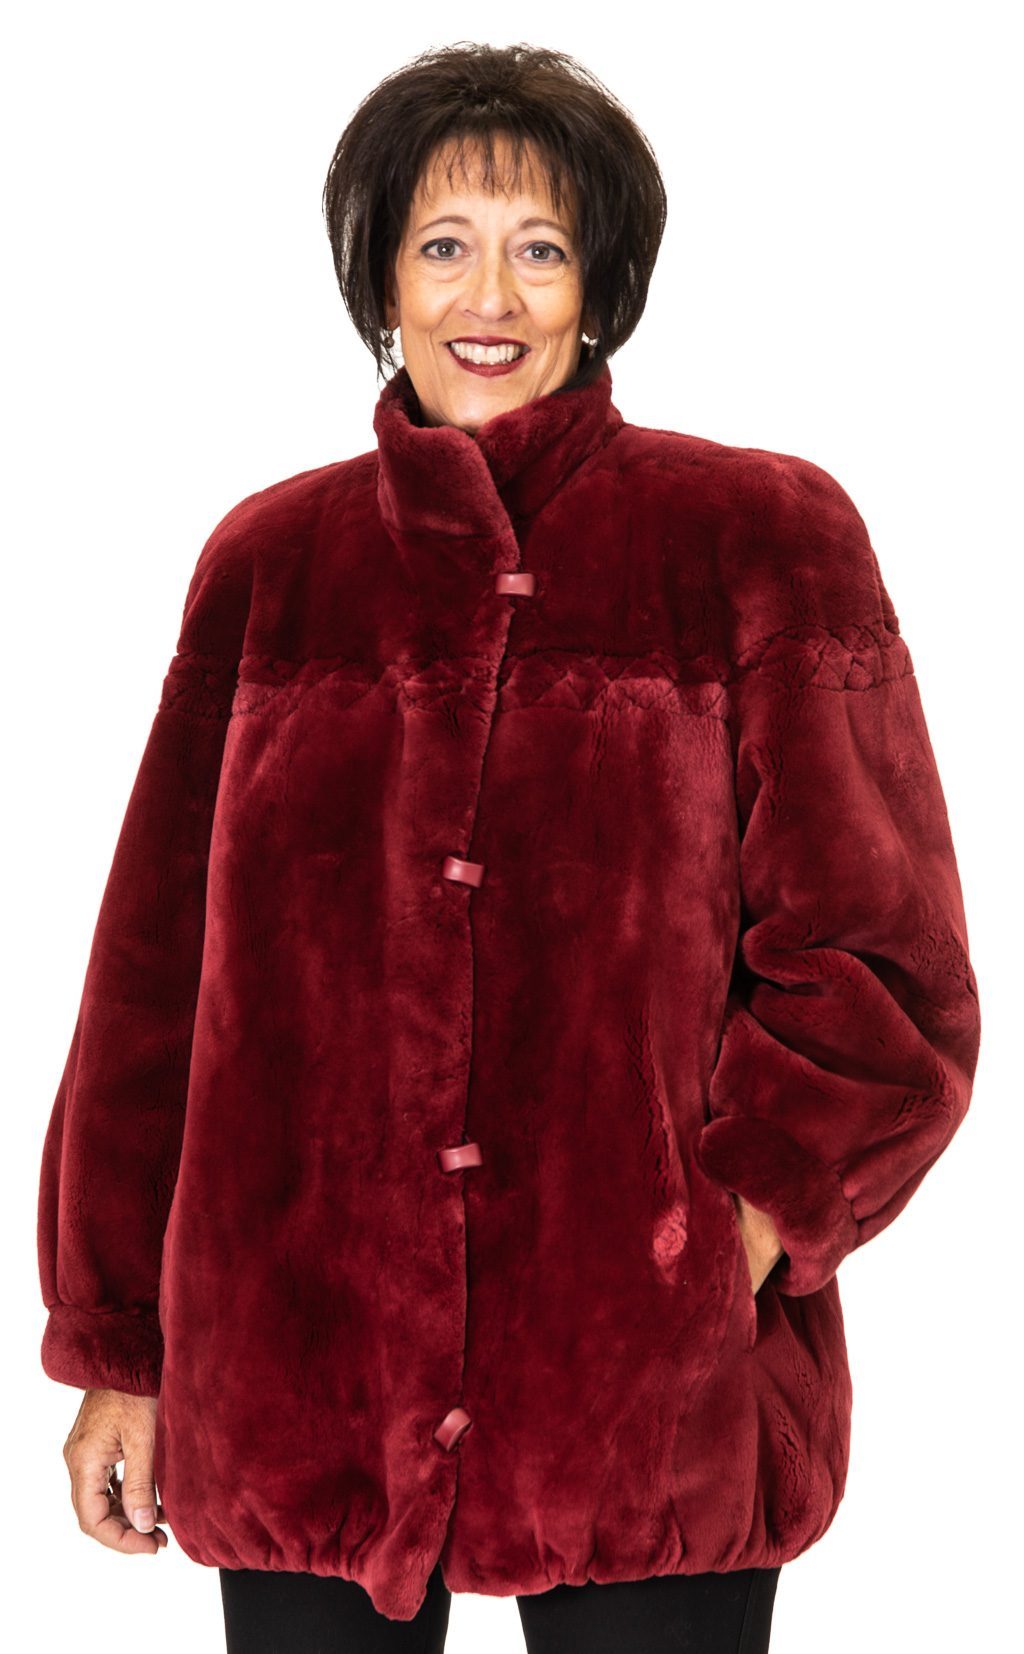 155 2 Sheared Beaver Ugent Furs